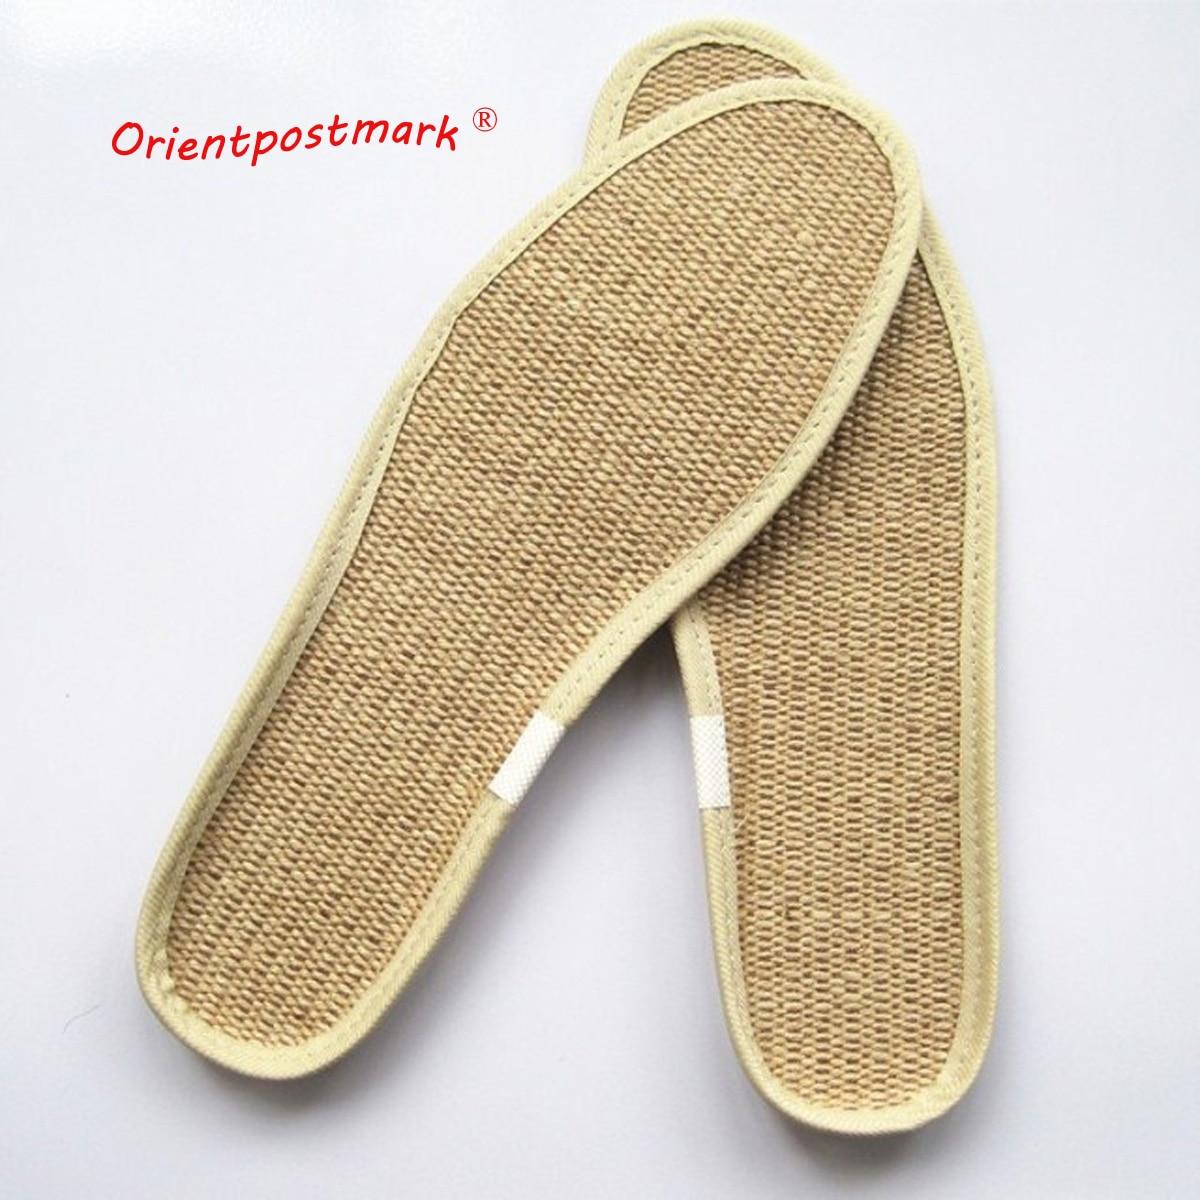 Jute EVA Insole Non-slip Linen Insole Durable Comfort Flax Absorbent  Breathable Unisex Sports Insoles Deodorant